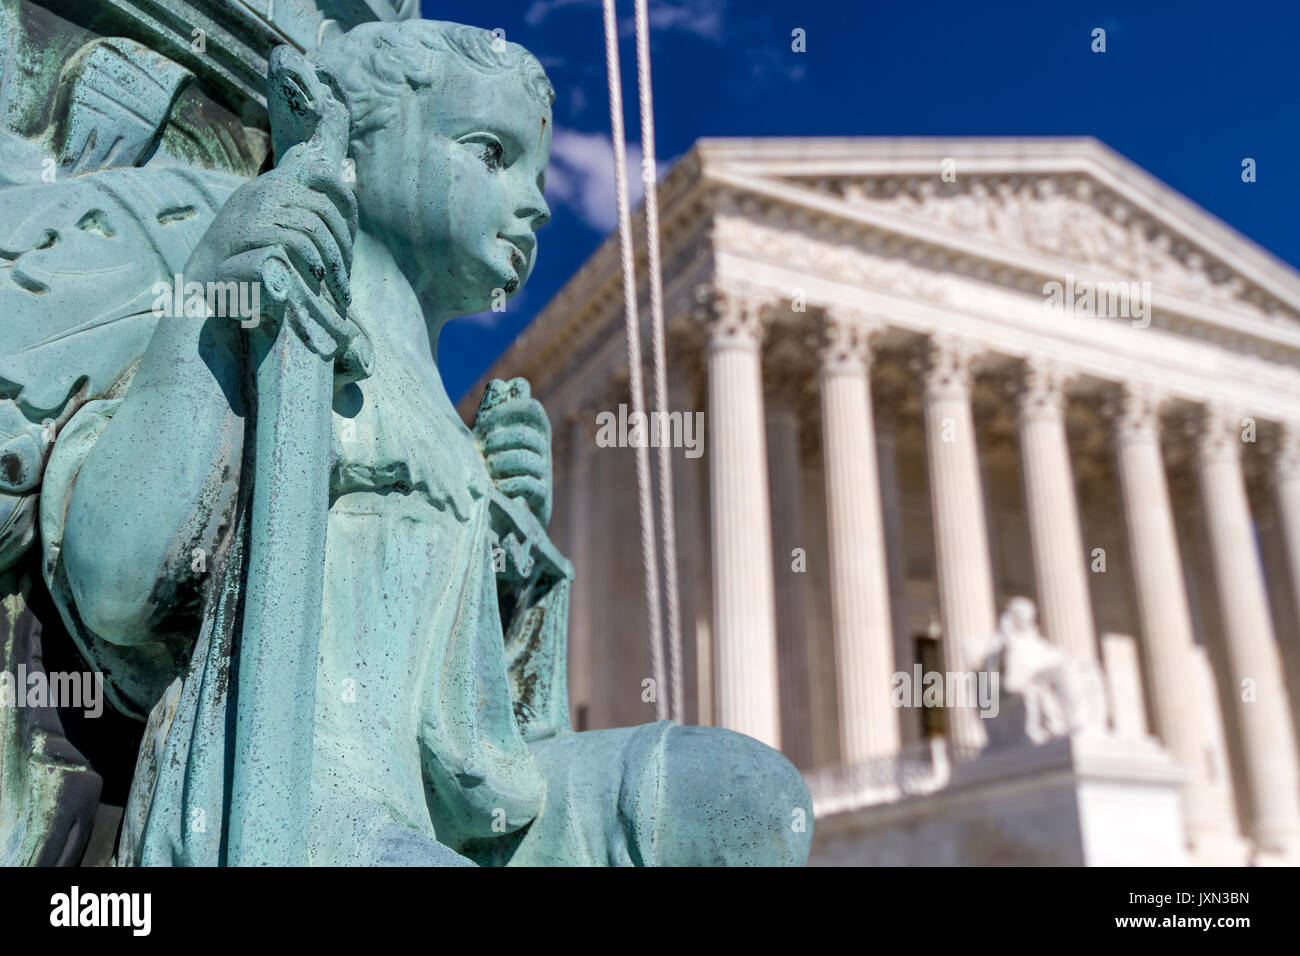 U.S. Supreme Court, Washington, D.C., U.S.A. - Stock Image